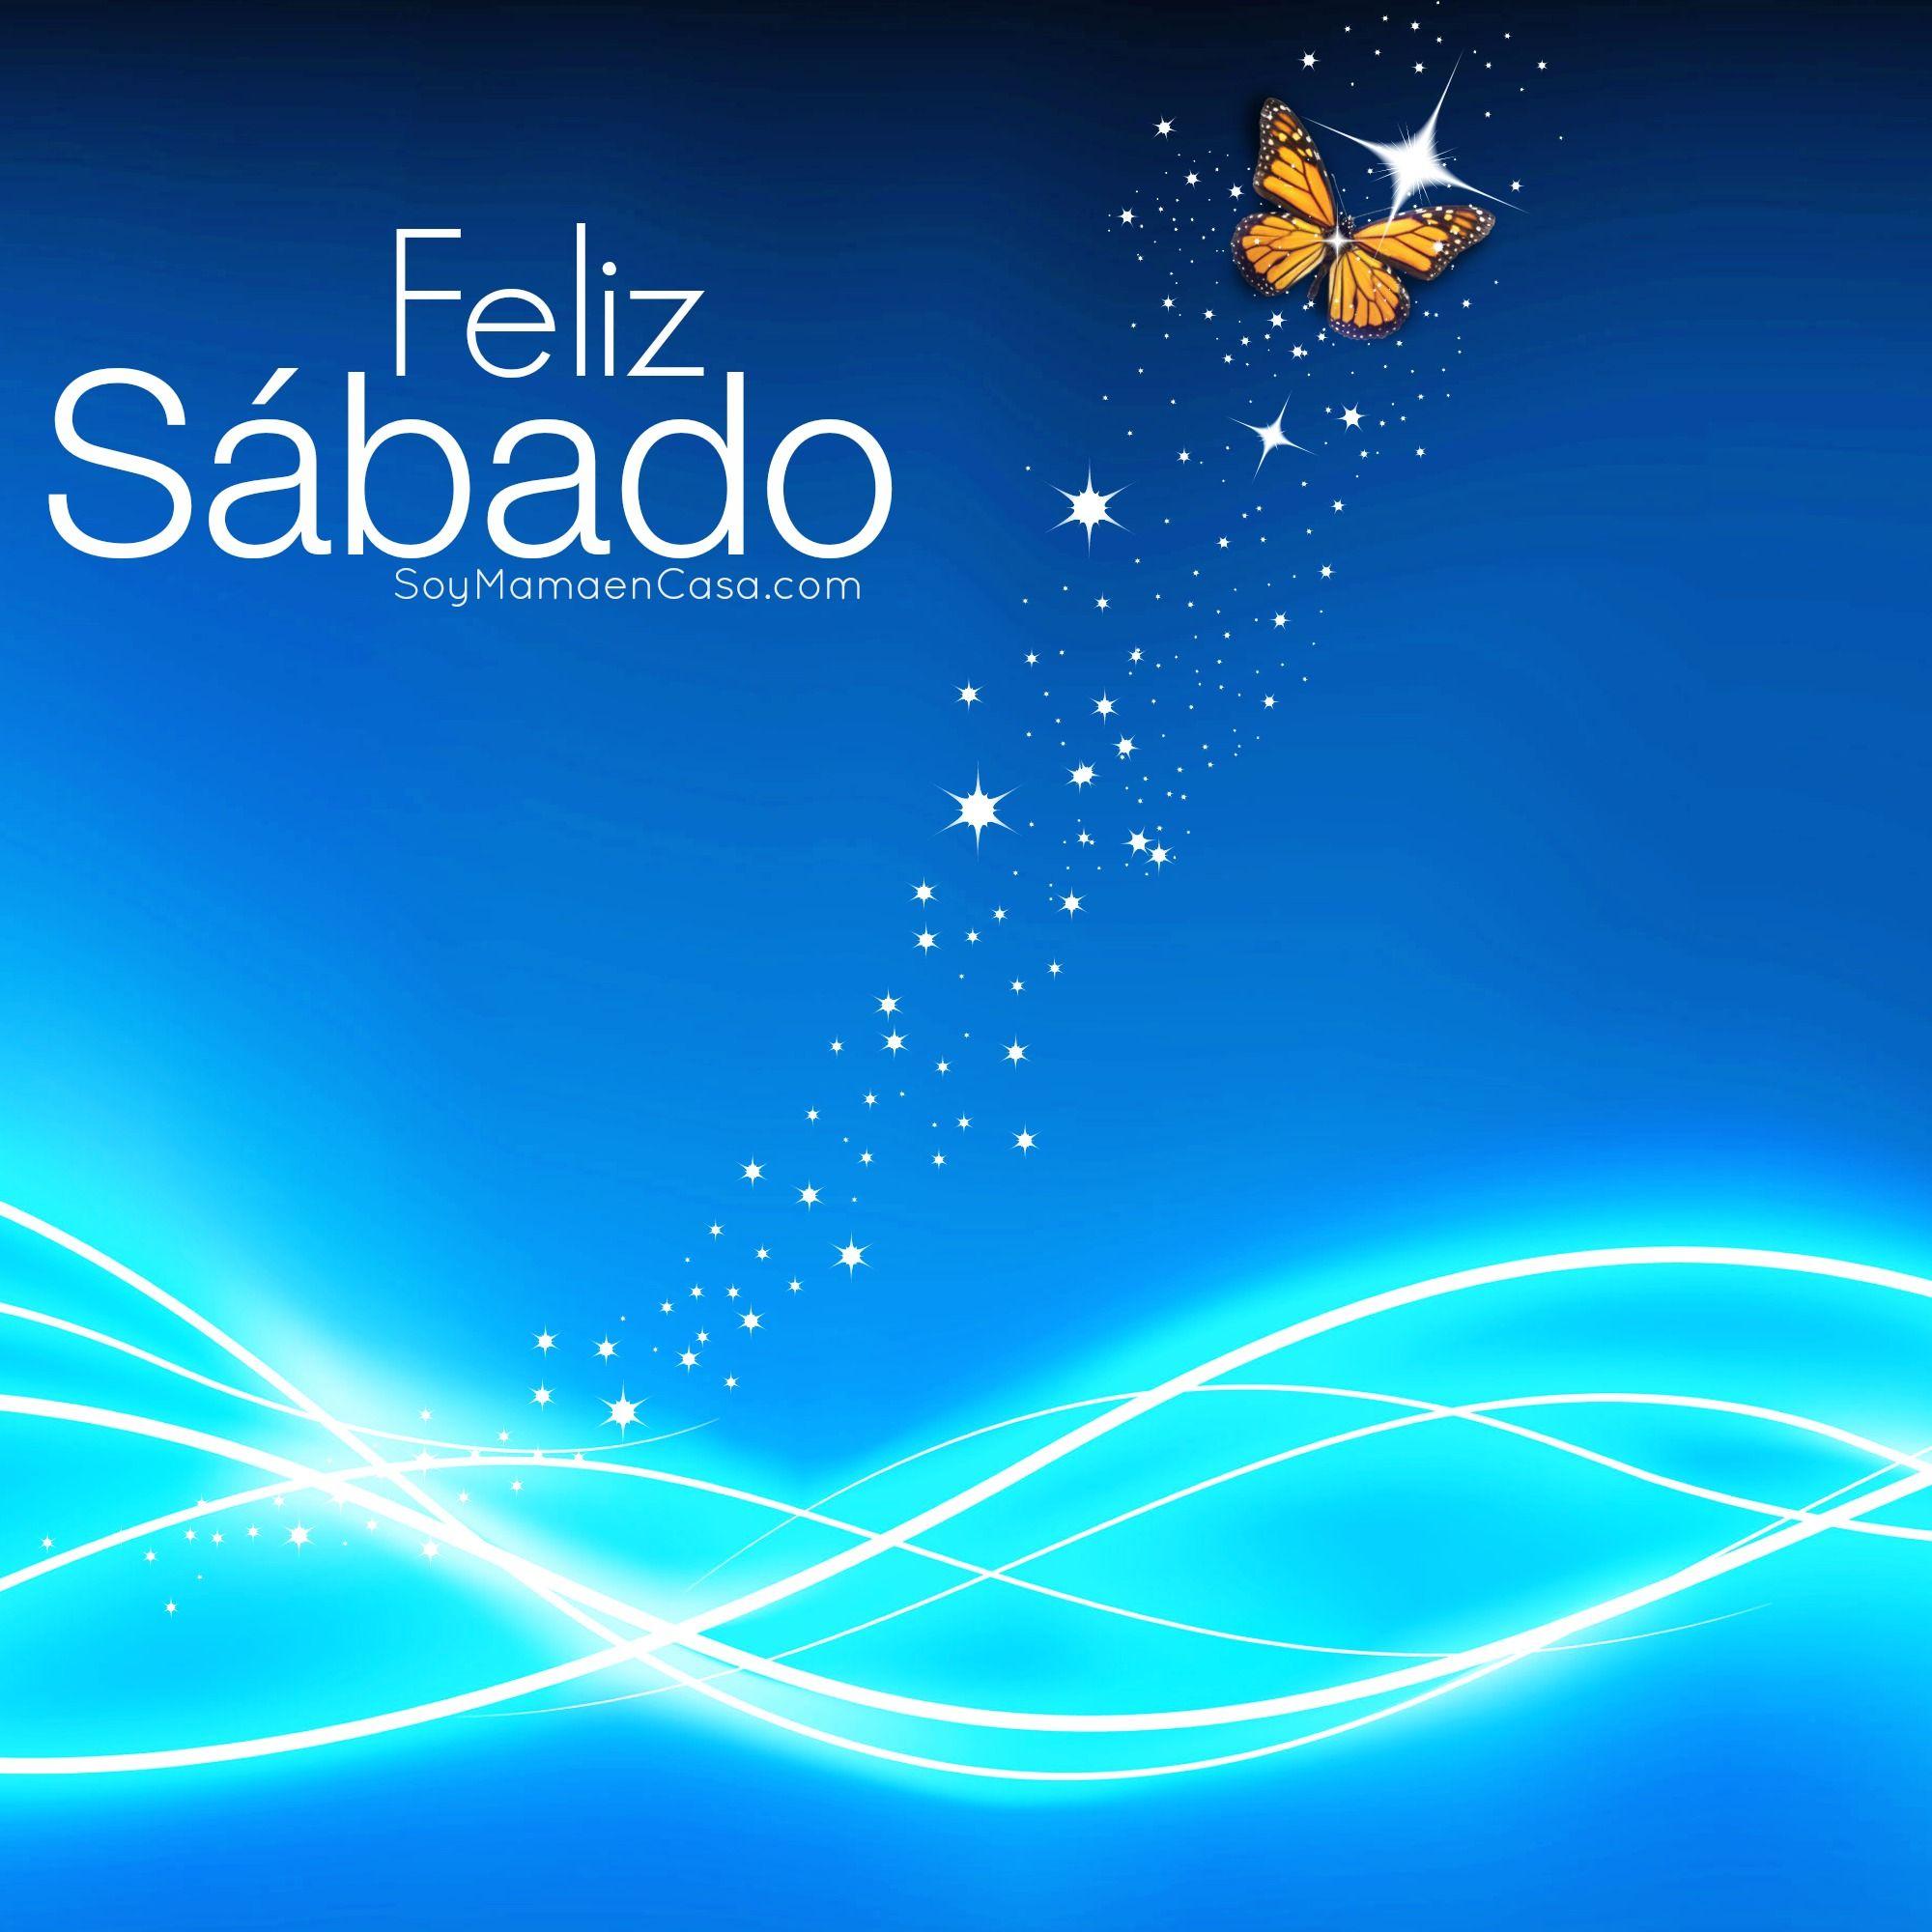 Hola Feliz Sábado Click Para Más Lindas Imágenes Y Tarjetas Para Saludar Feliz Sábado Feliz Sabado Frases Buenos Dias Feliz Sabado